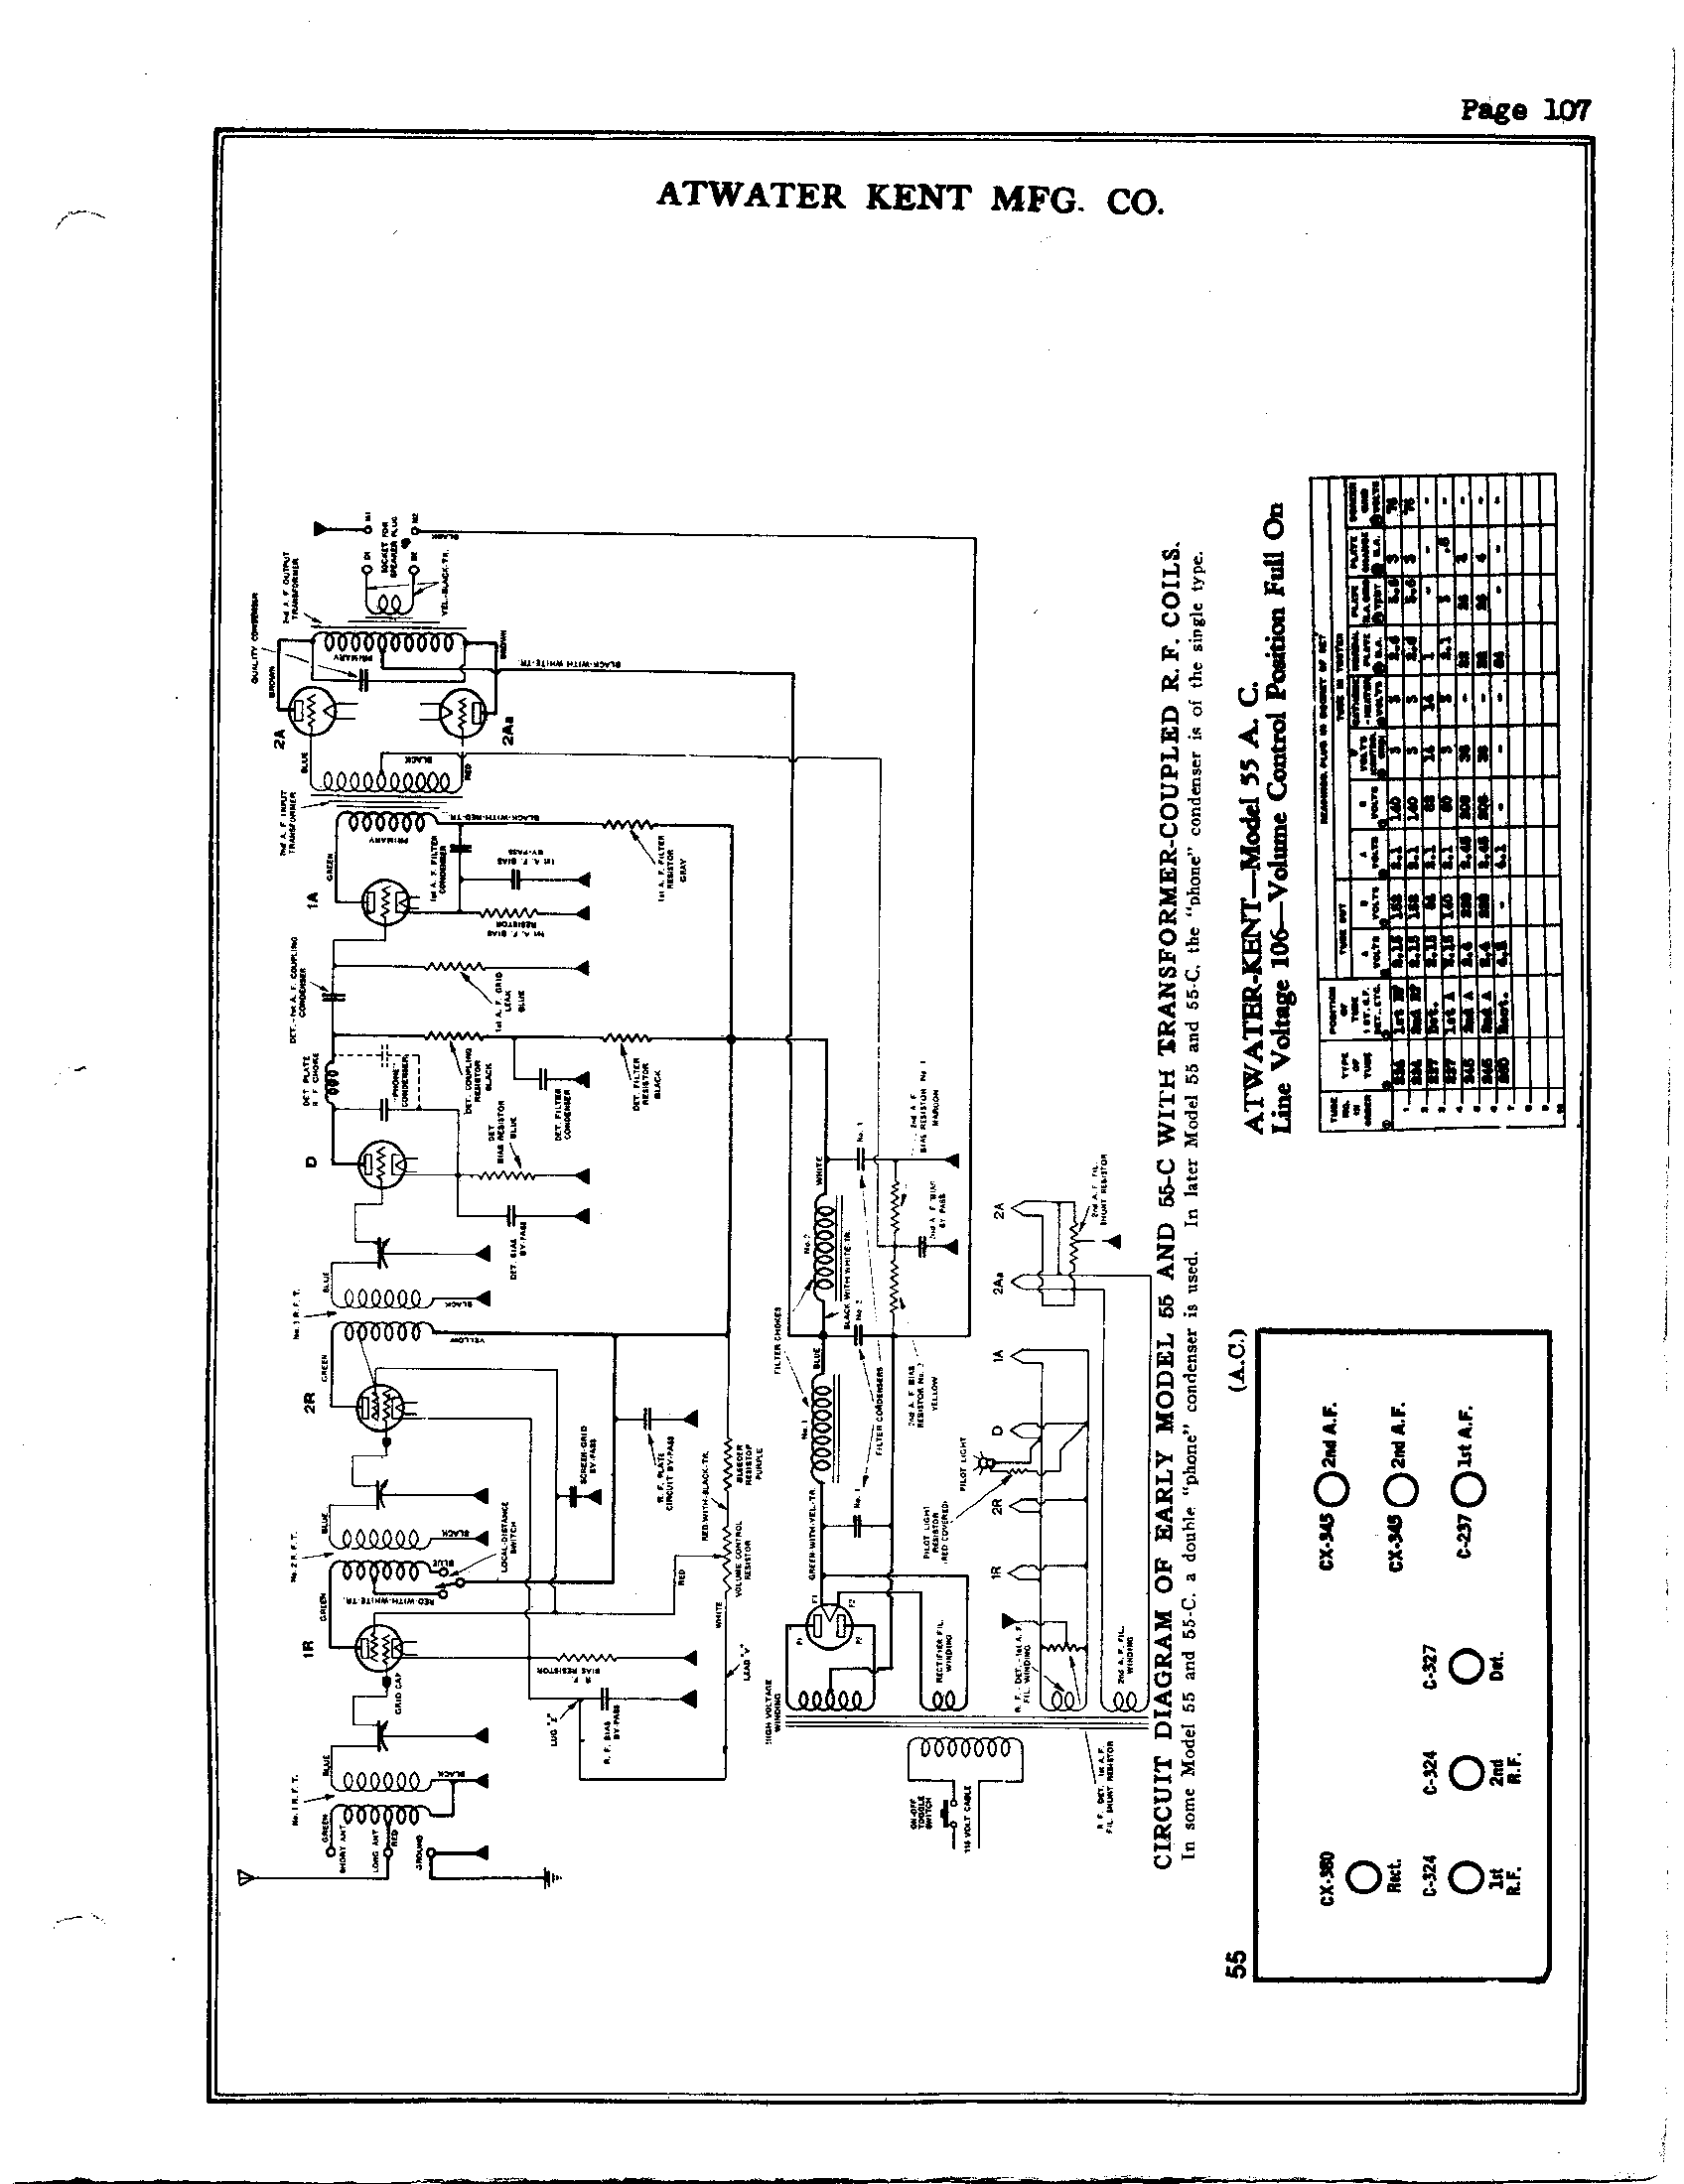 HZ_9190] Air Conditioner Wiring Diagram Asv Rc85 Schematic WiringIsop Comin Exmet Wned Vira Tixat Mohammedshrine Librar Wiring 101